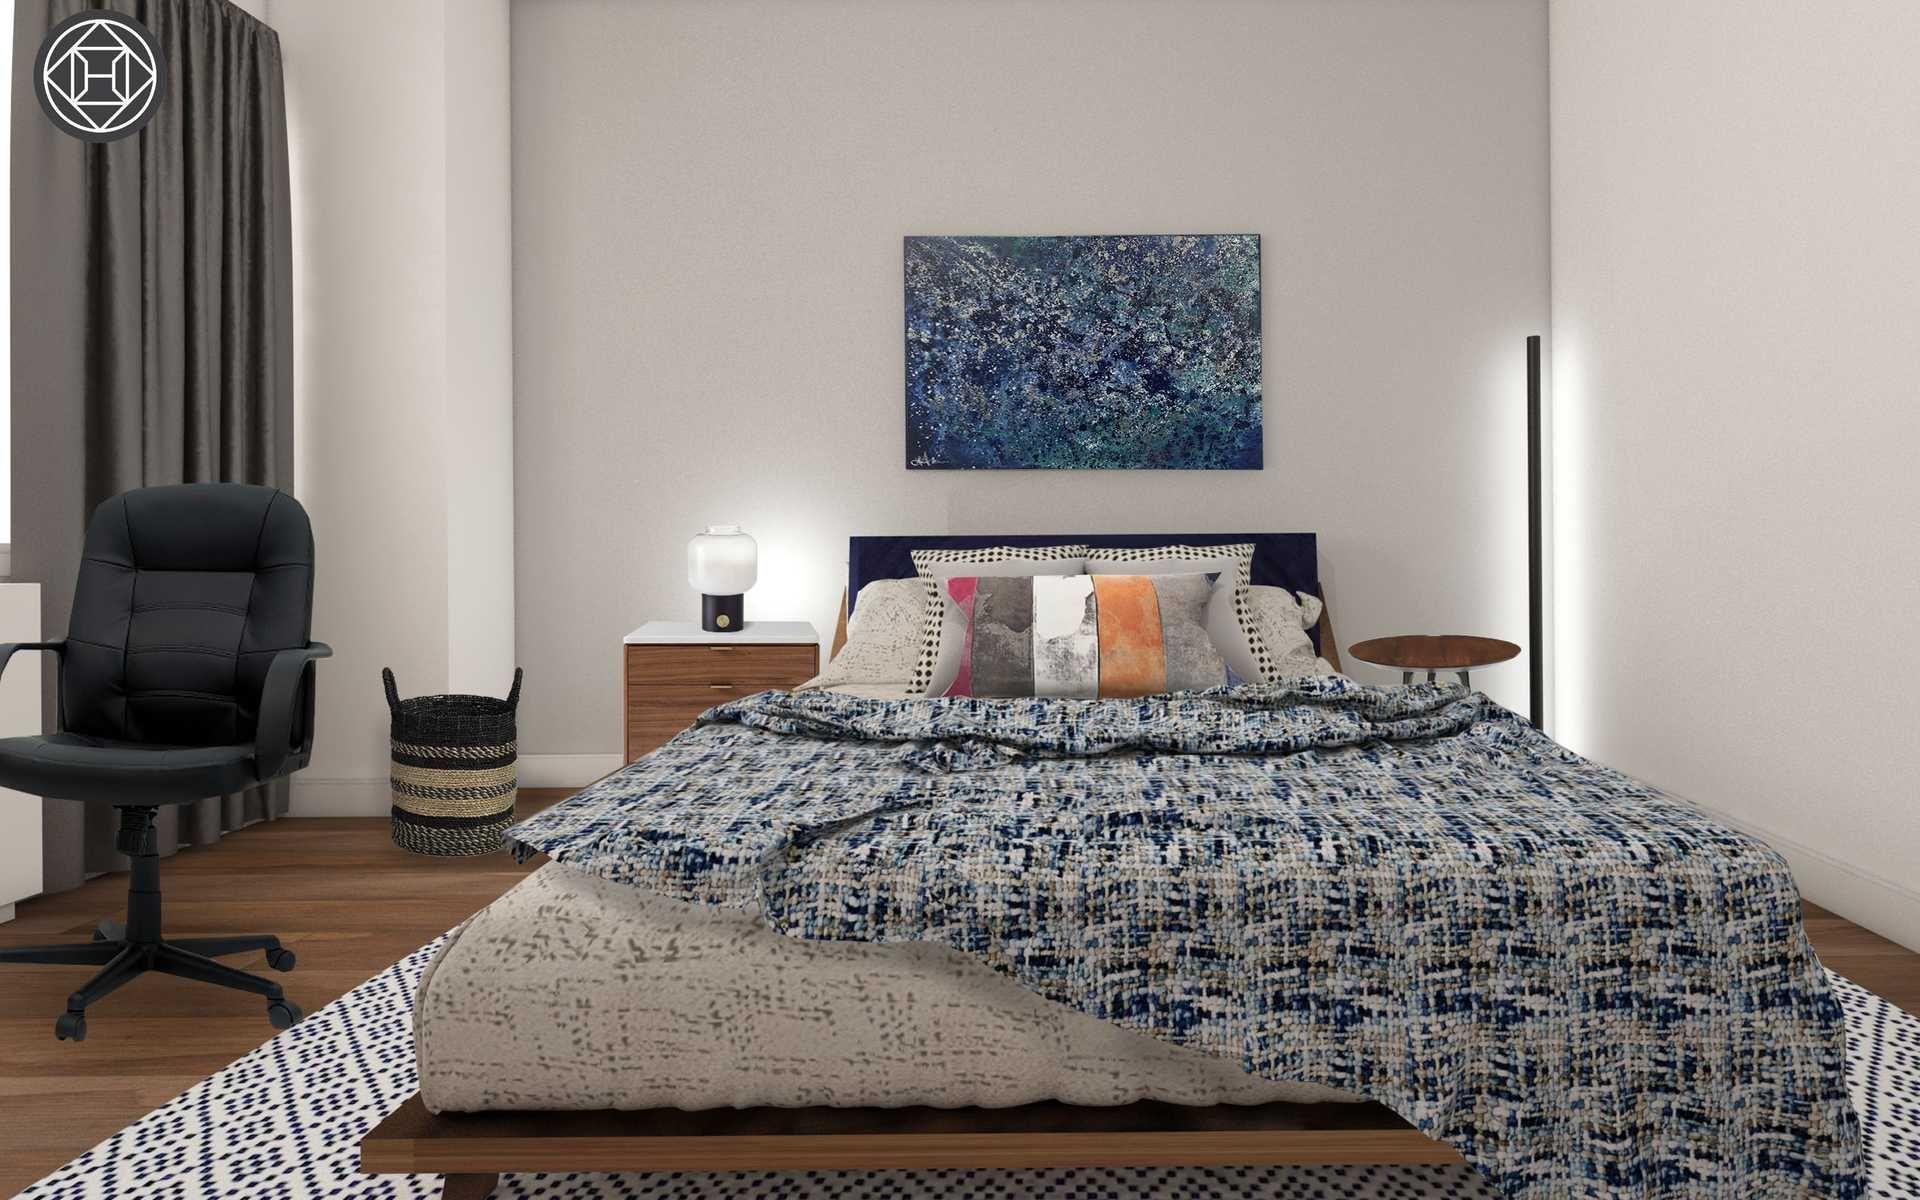 Contemporary Bedroom Design By Havenly Interior Designer Sharon Bedroom Design Contemporary Bedroom Design Interior Design